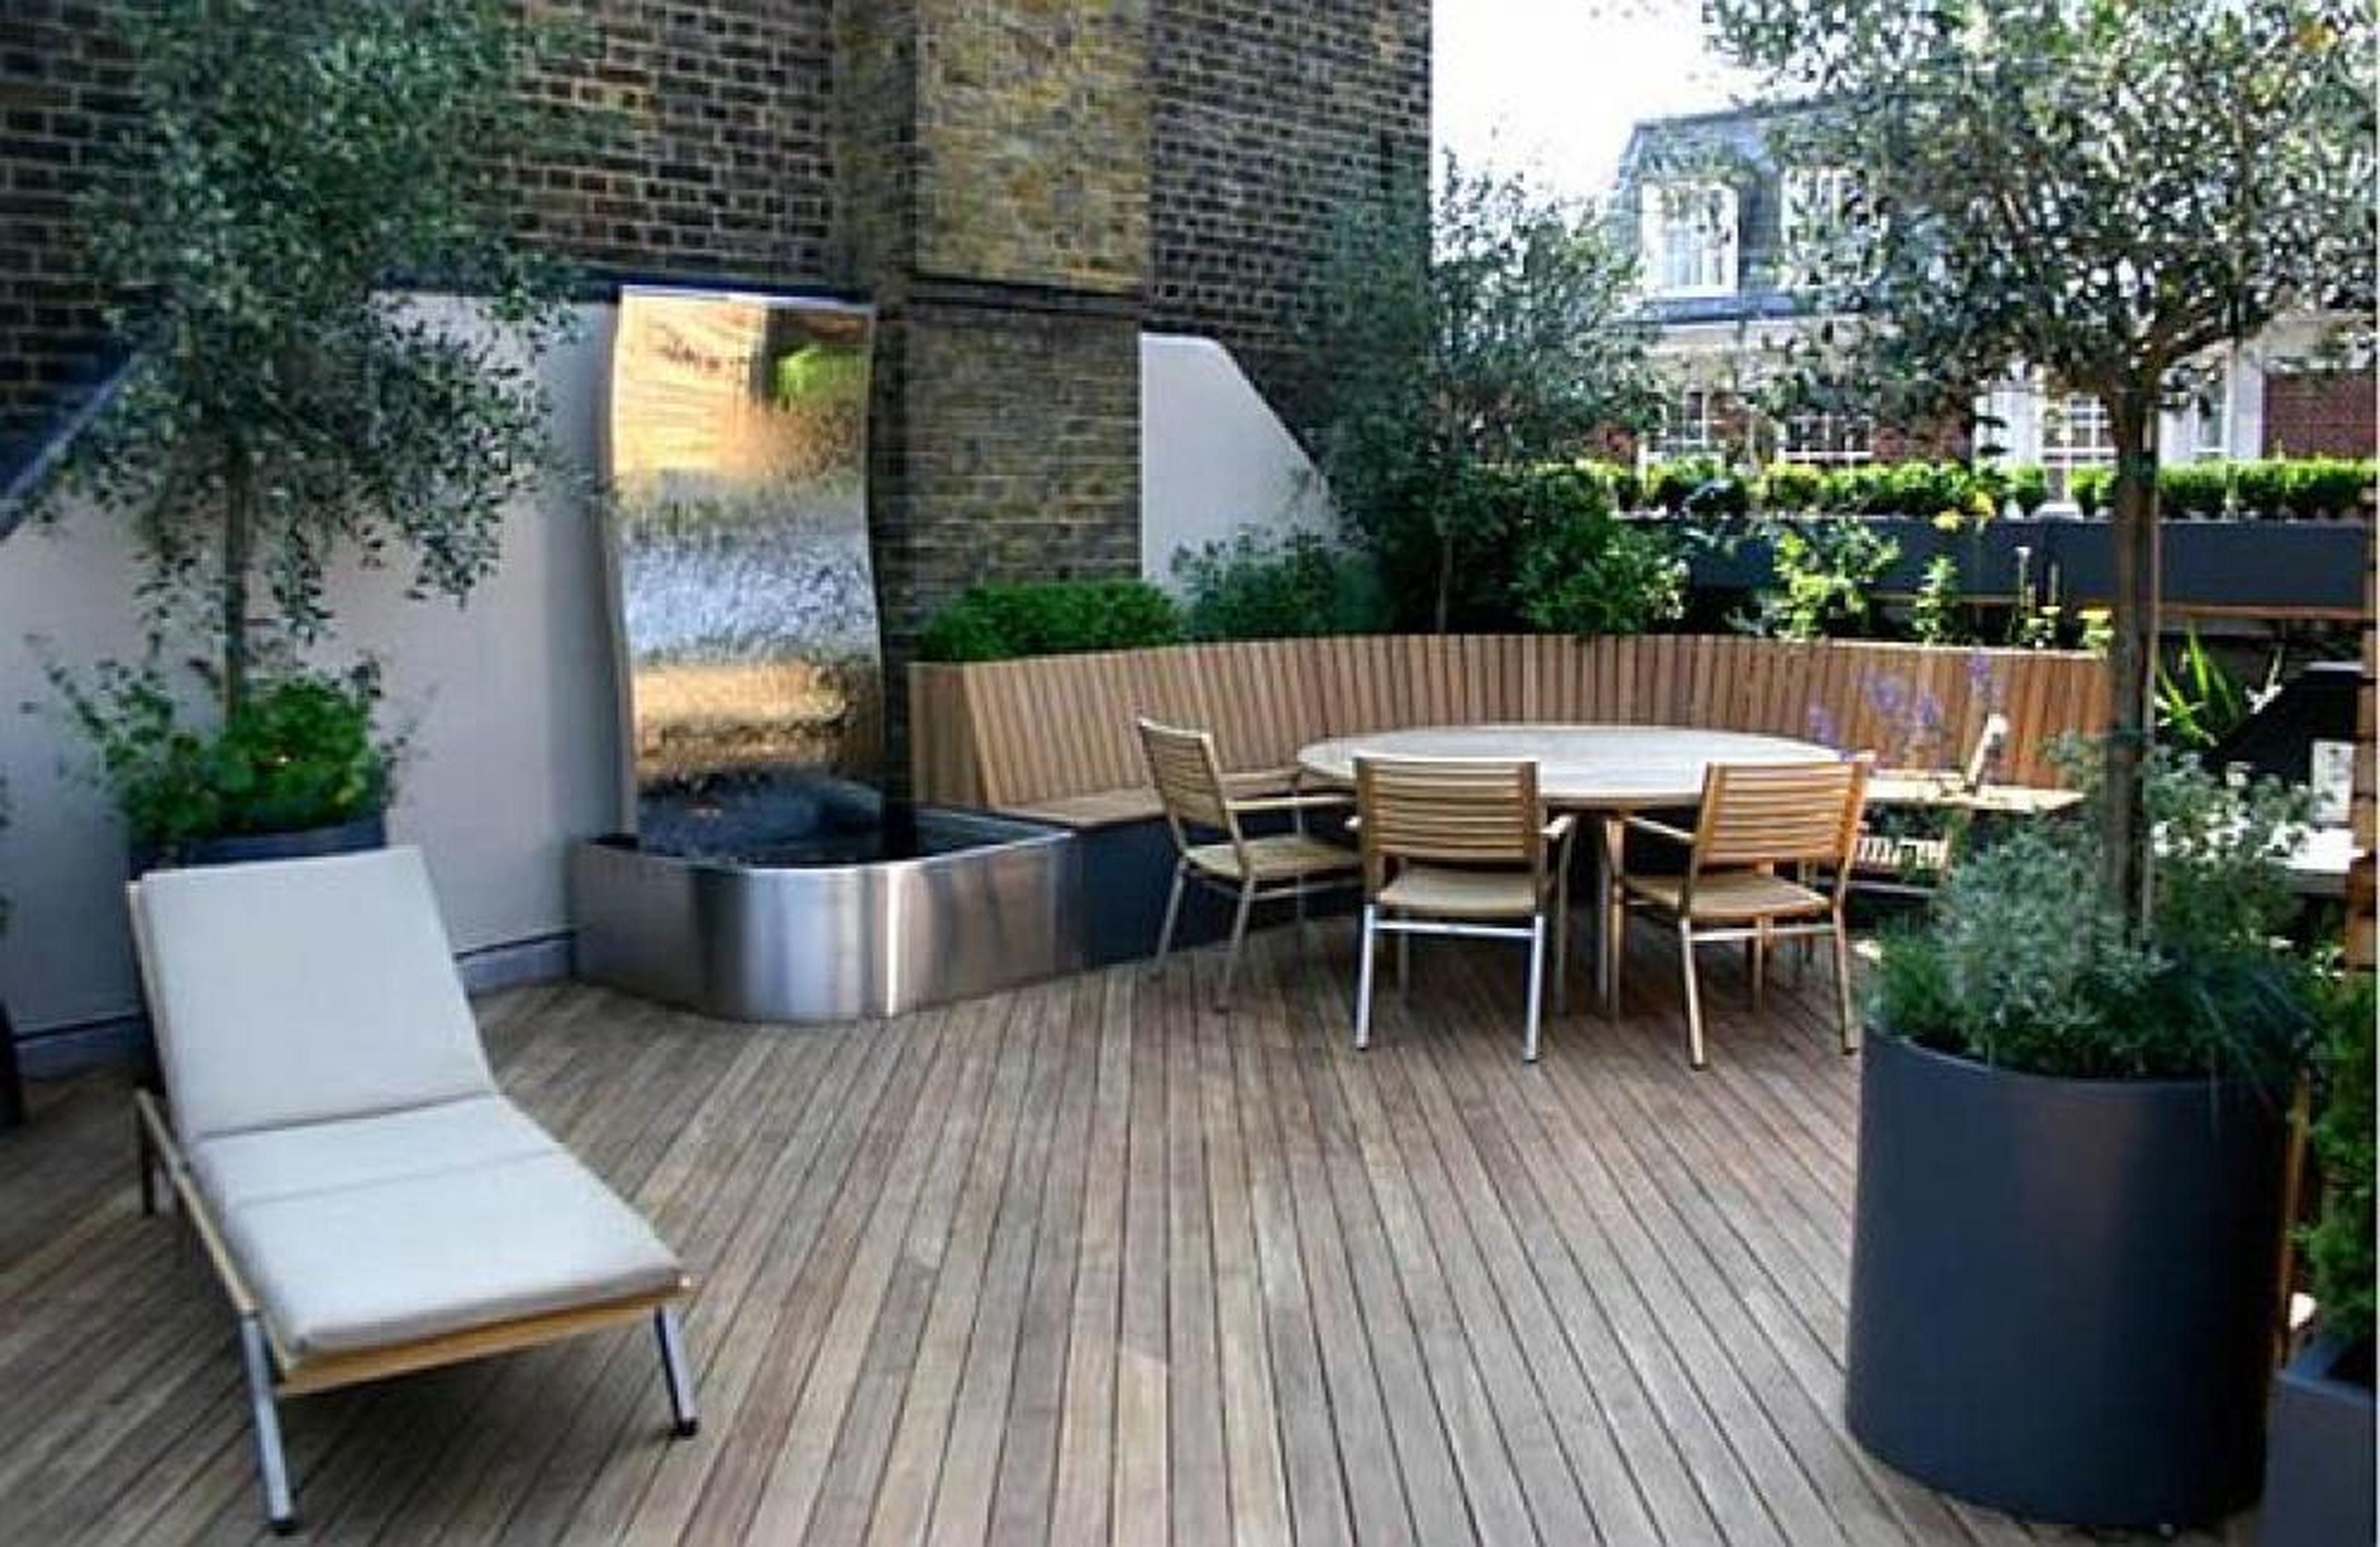 Brillian Modern Balconies Garden Design Ideas Outdoor Patio Decor Roof Terrace Design Patio Design